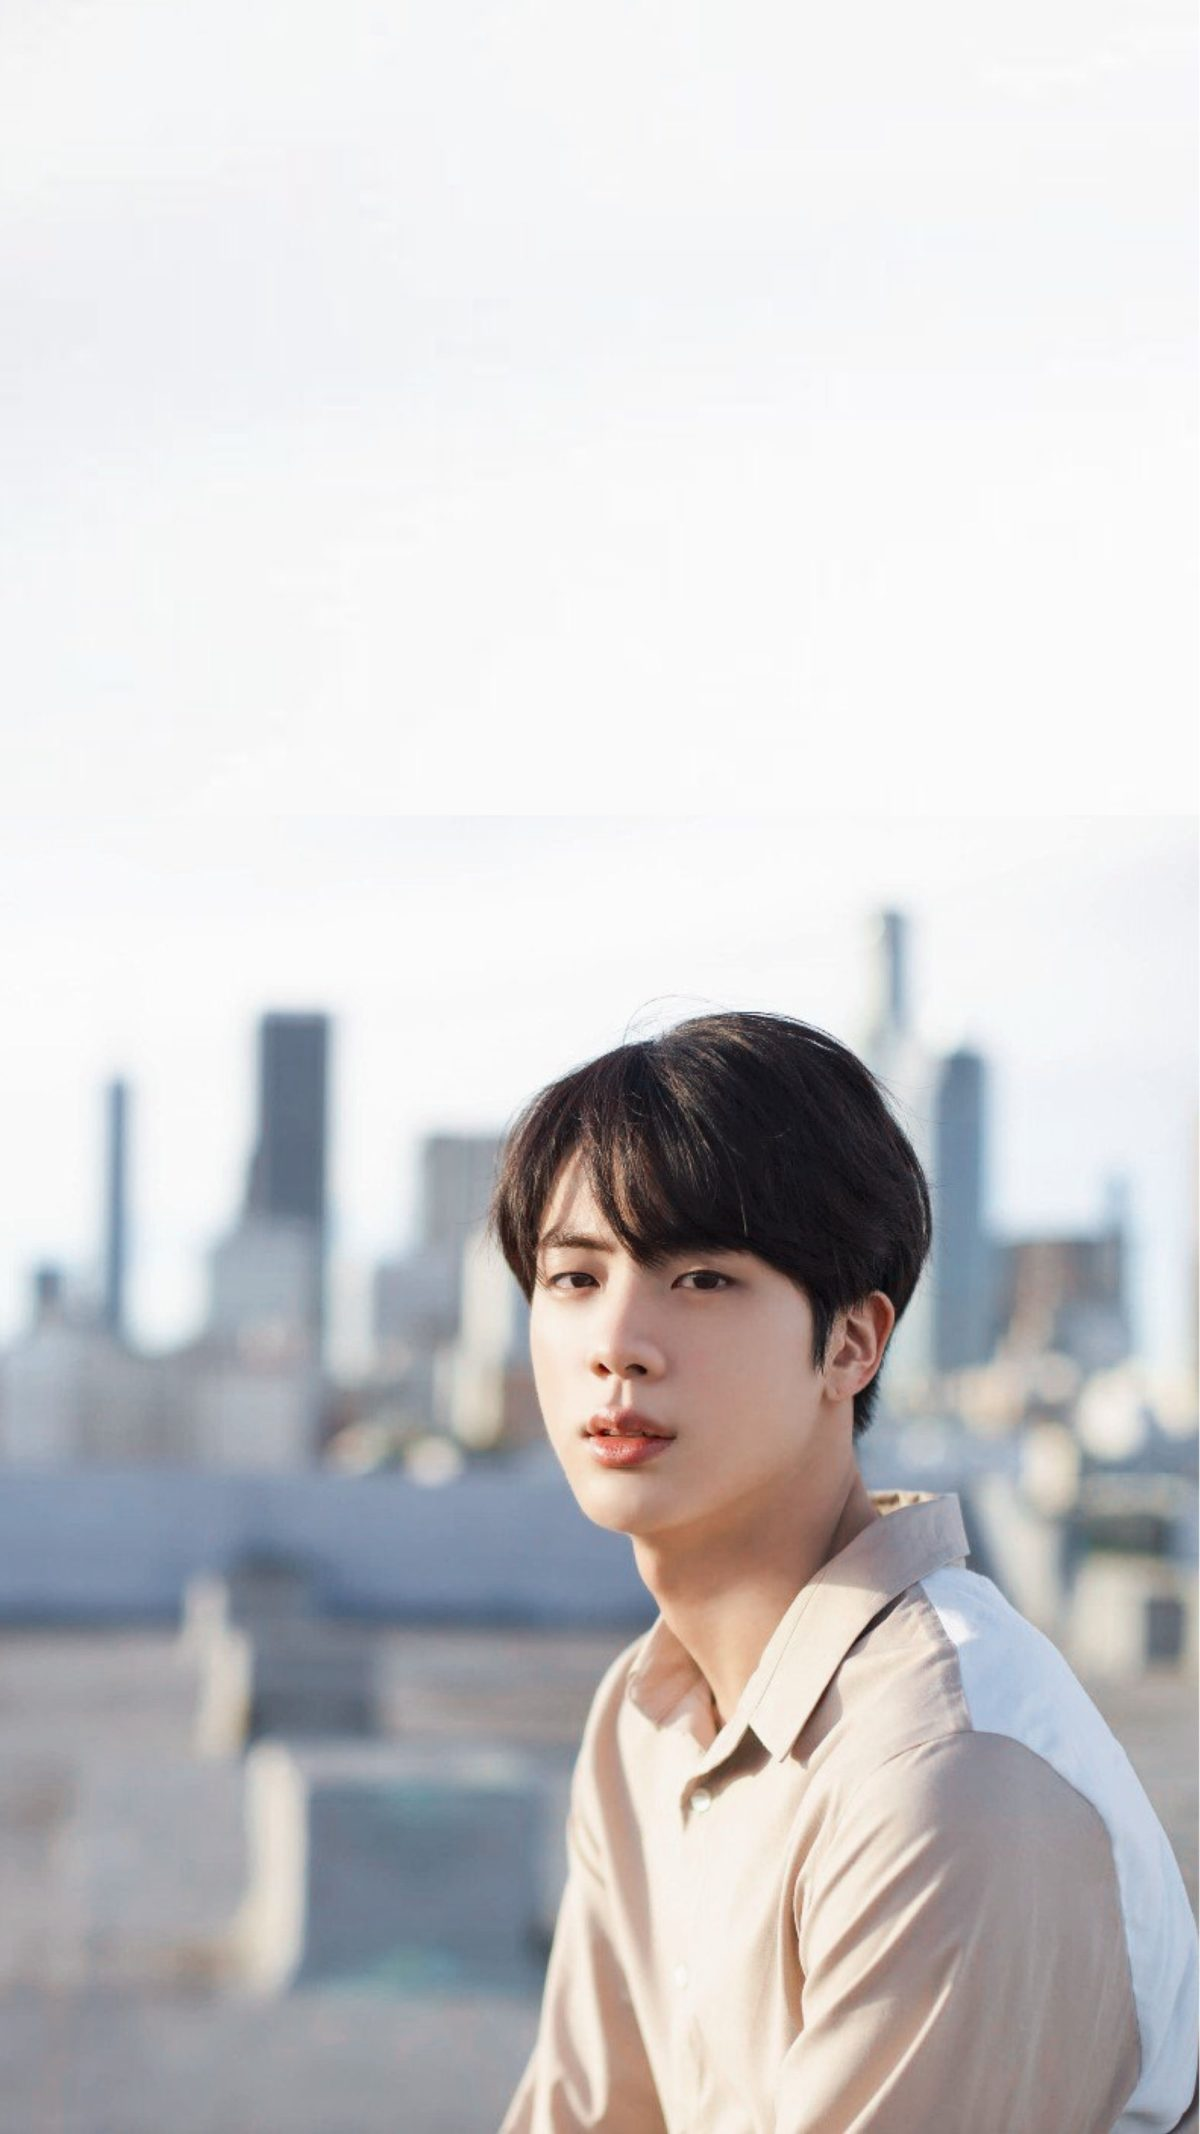 BTS Jin wallpaper | Kim Seok-jin (Jin) | Pinterest | BTS, Bts jin …